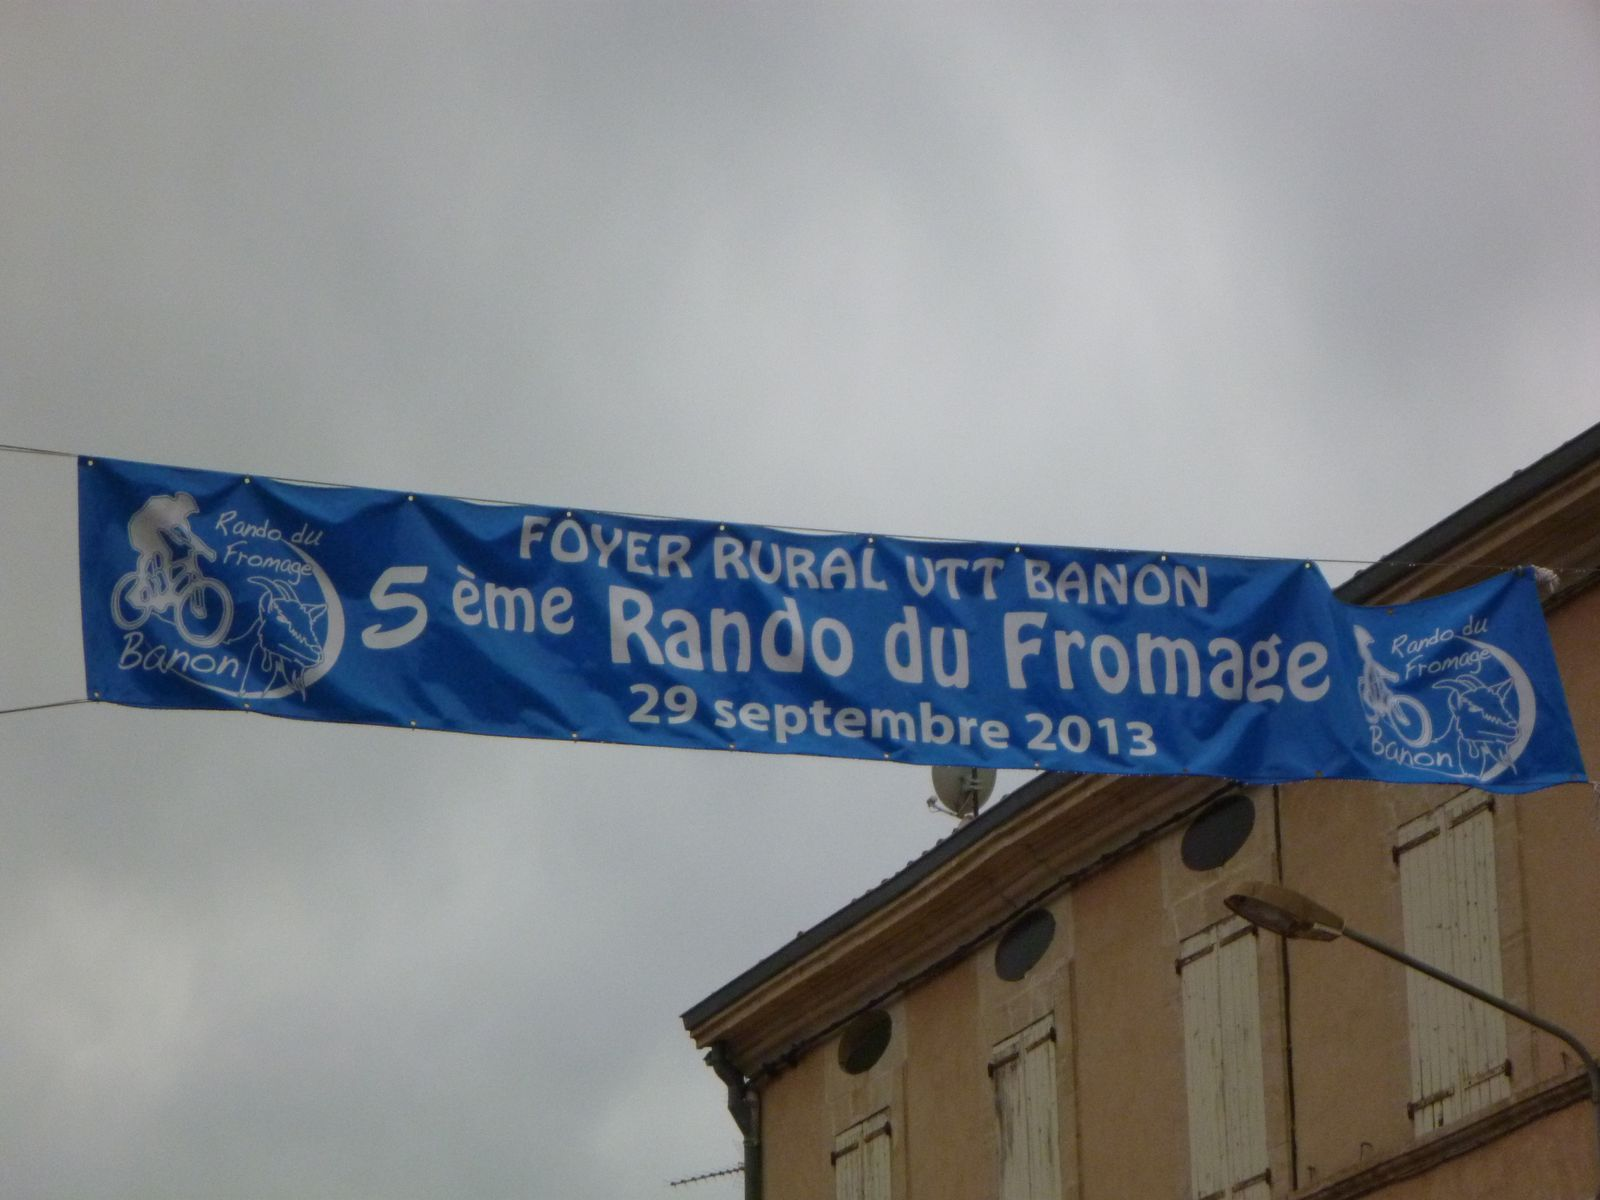 La Rando du Fromage à Banon 29/09/2013